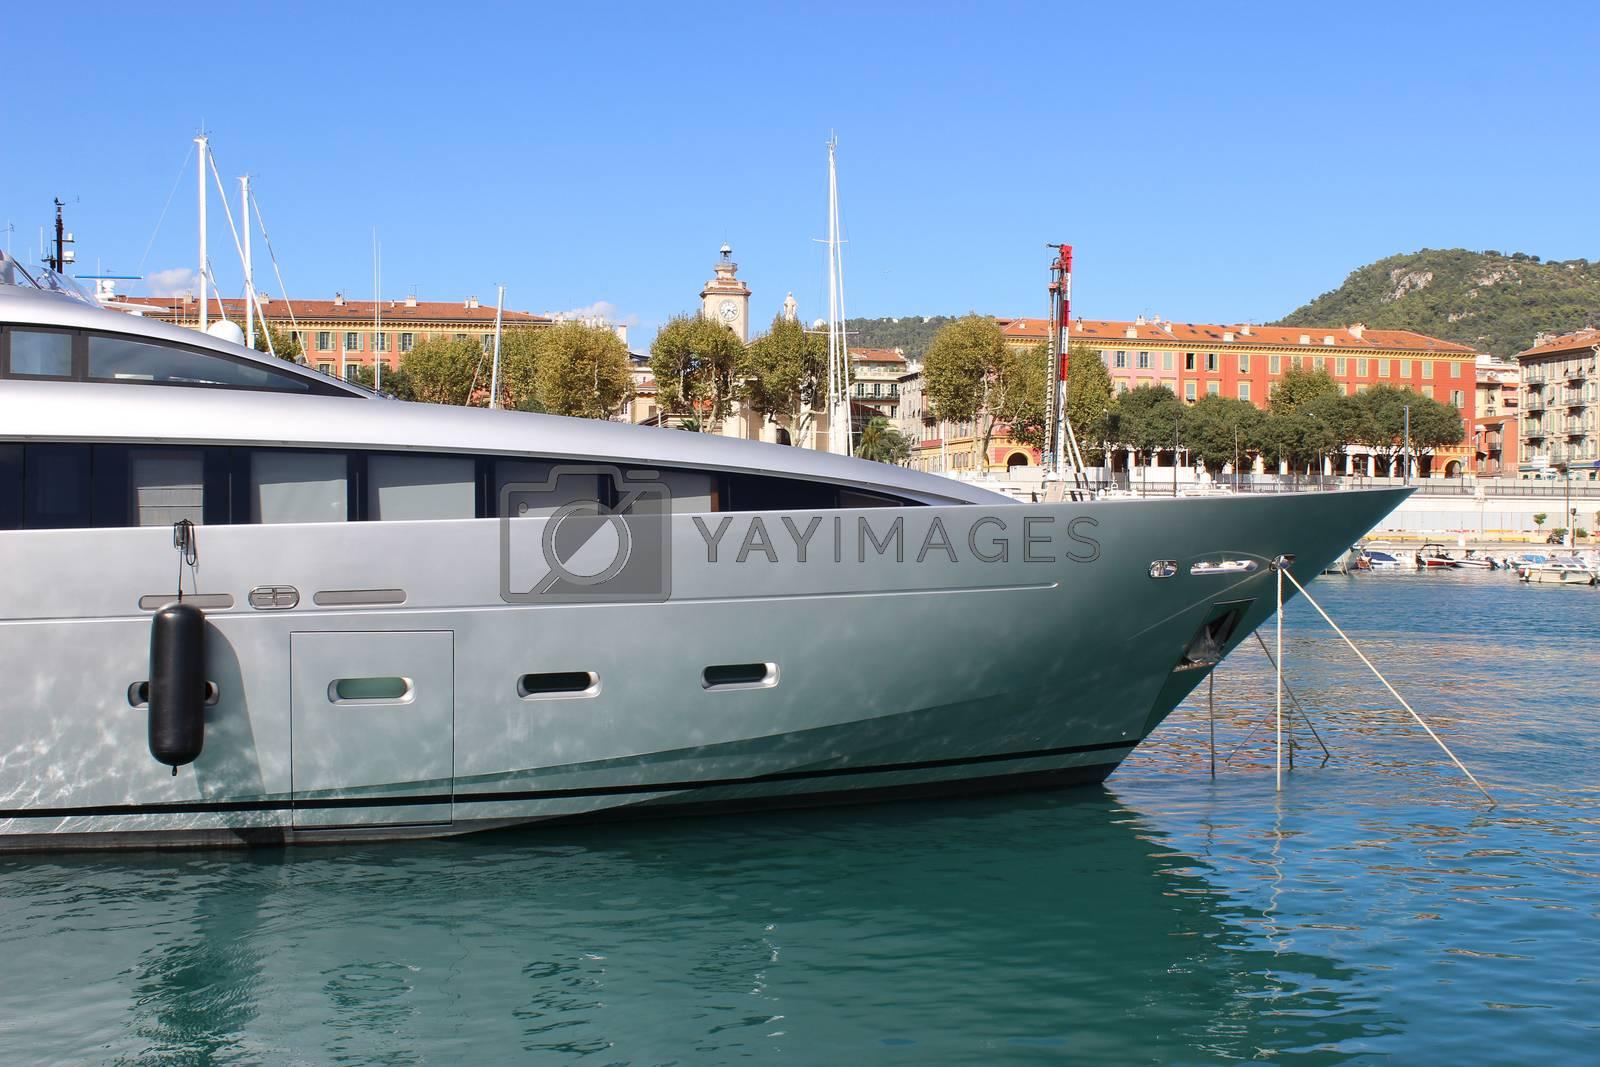 Luxury Yacht in Nice by bensib